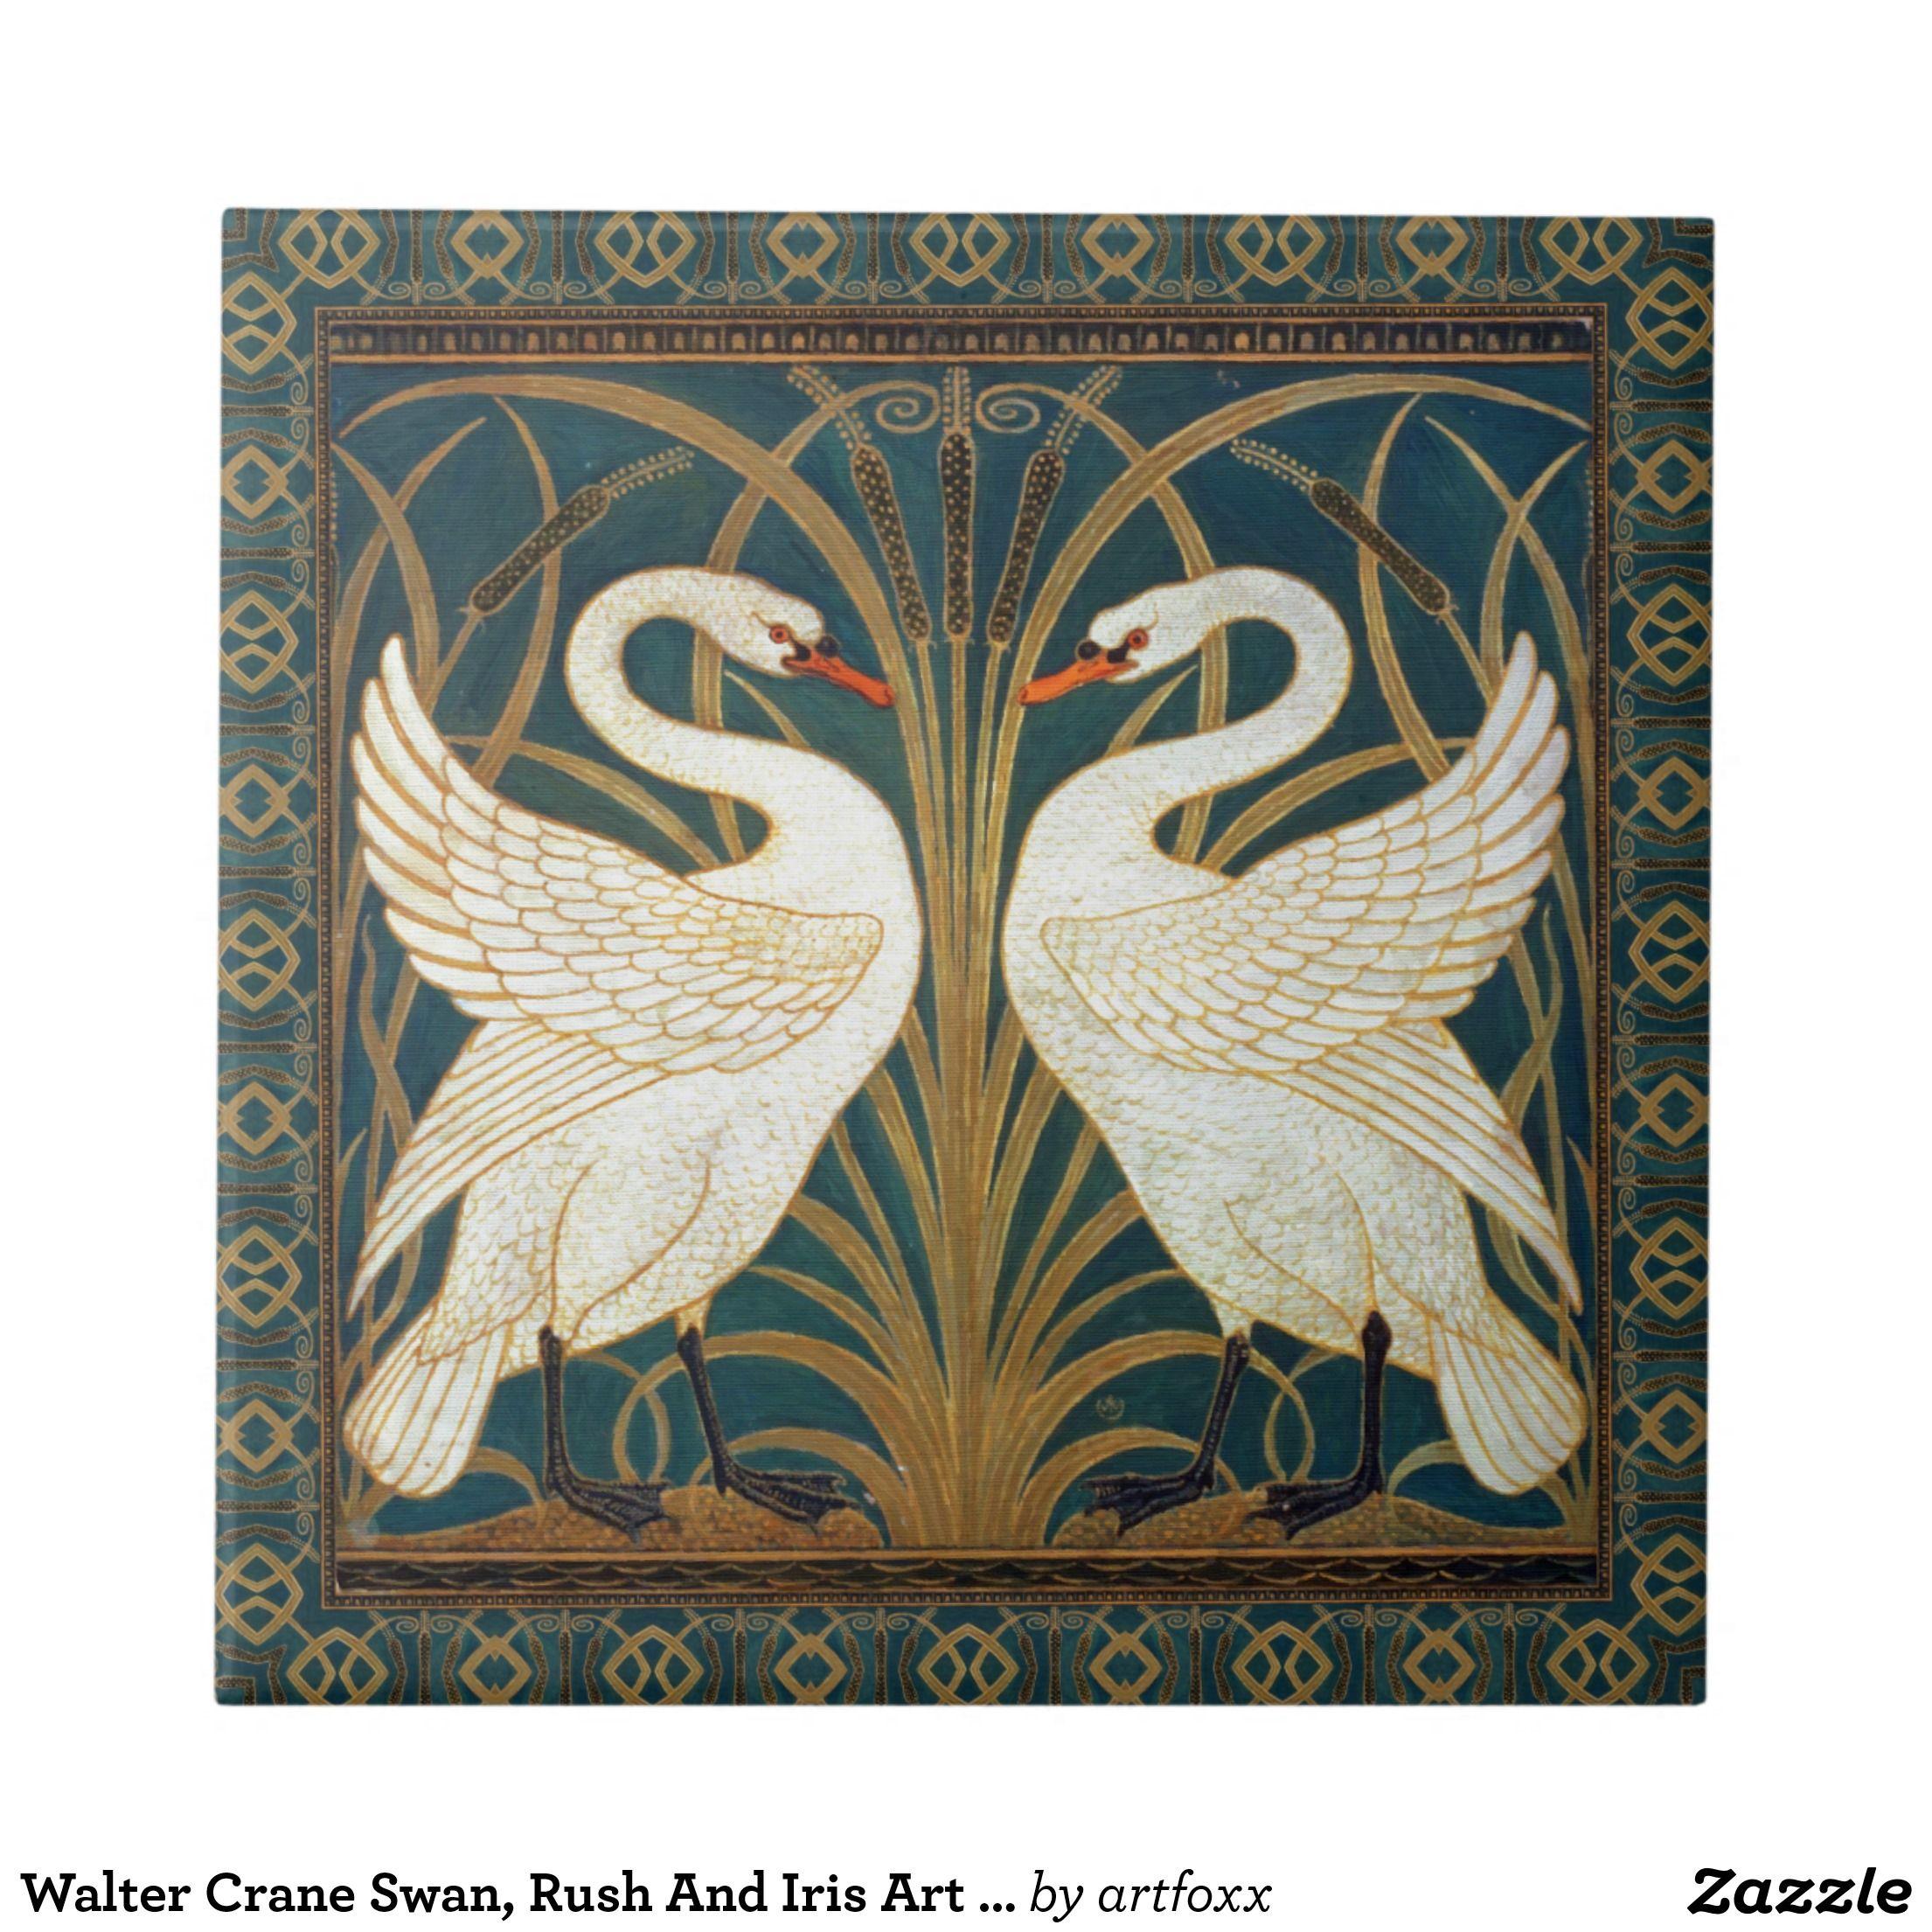 Walter crane swan rush and iris art nouveau ceramic tile tile walter crane swan rush and iris art nouveau ceramic tile dailygadgetfo Choice Image